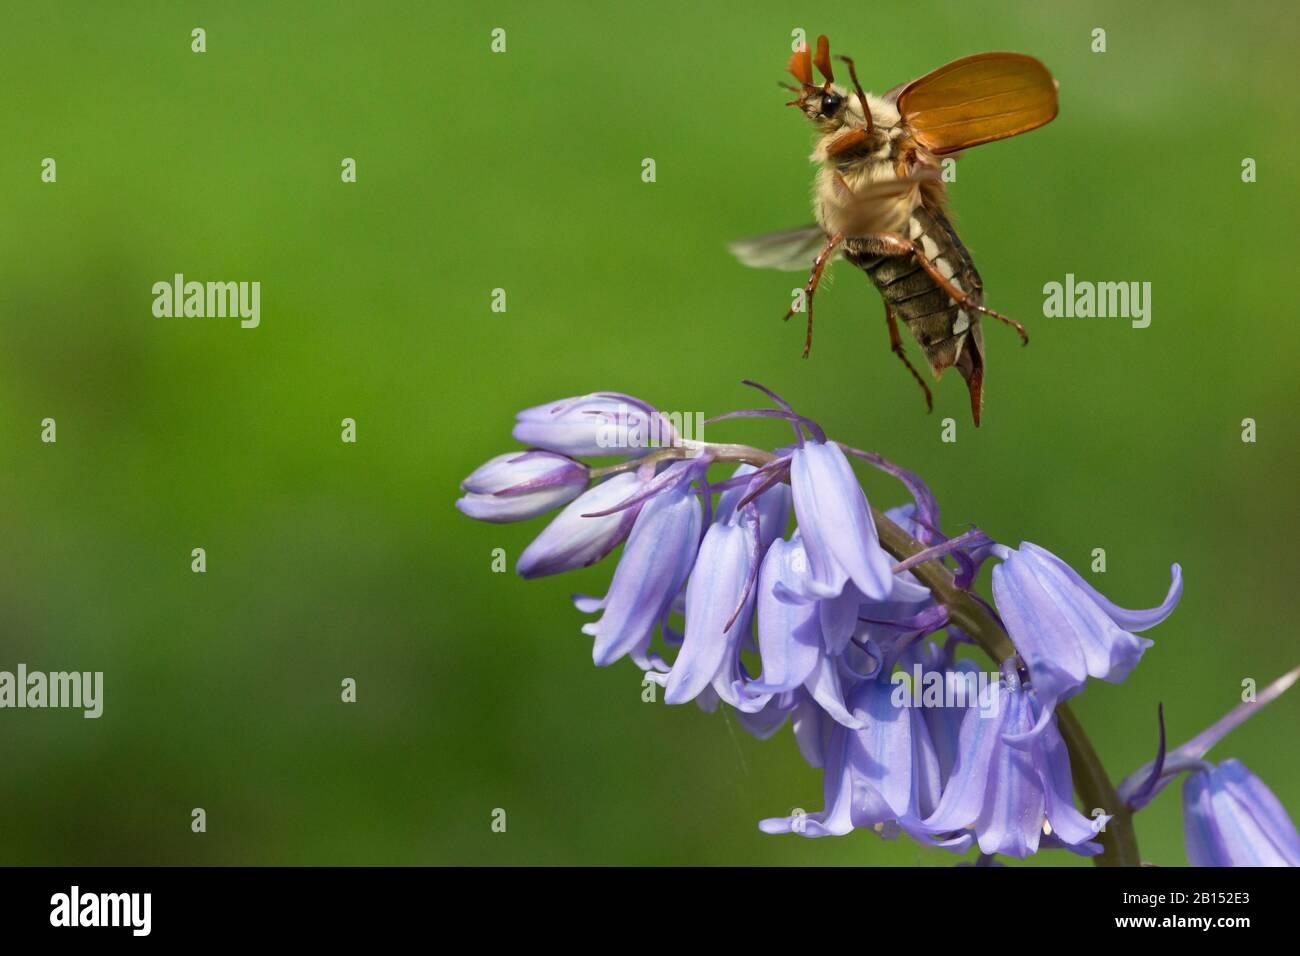 Common cockchafer, Maybug, Maybeetle (Melolontha melolontha), landing on Bluebell, Netherlands Stock Photo